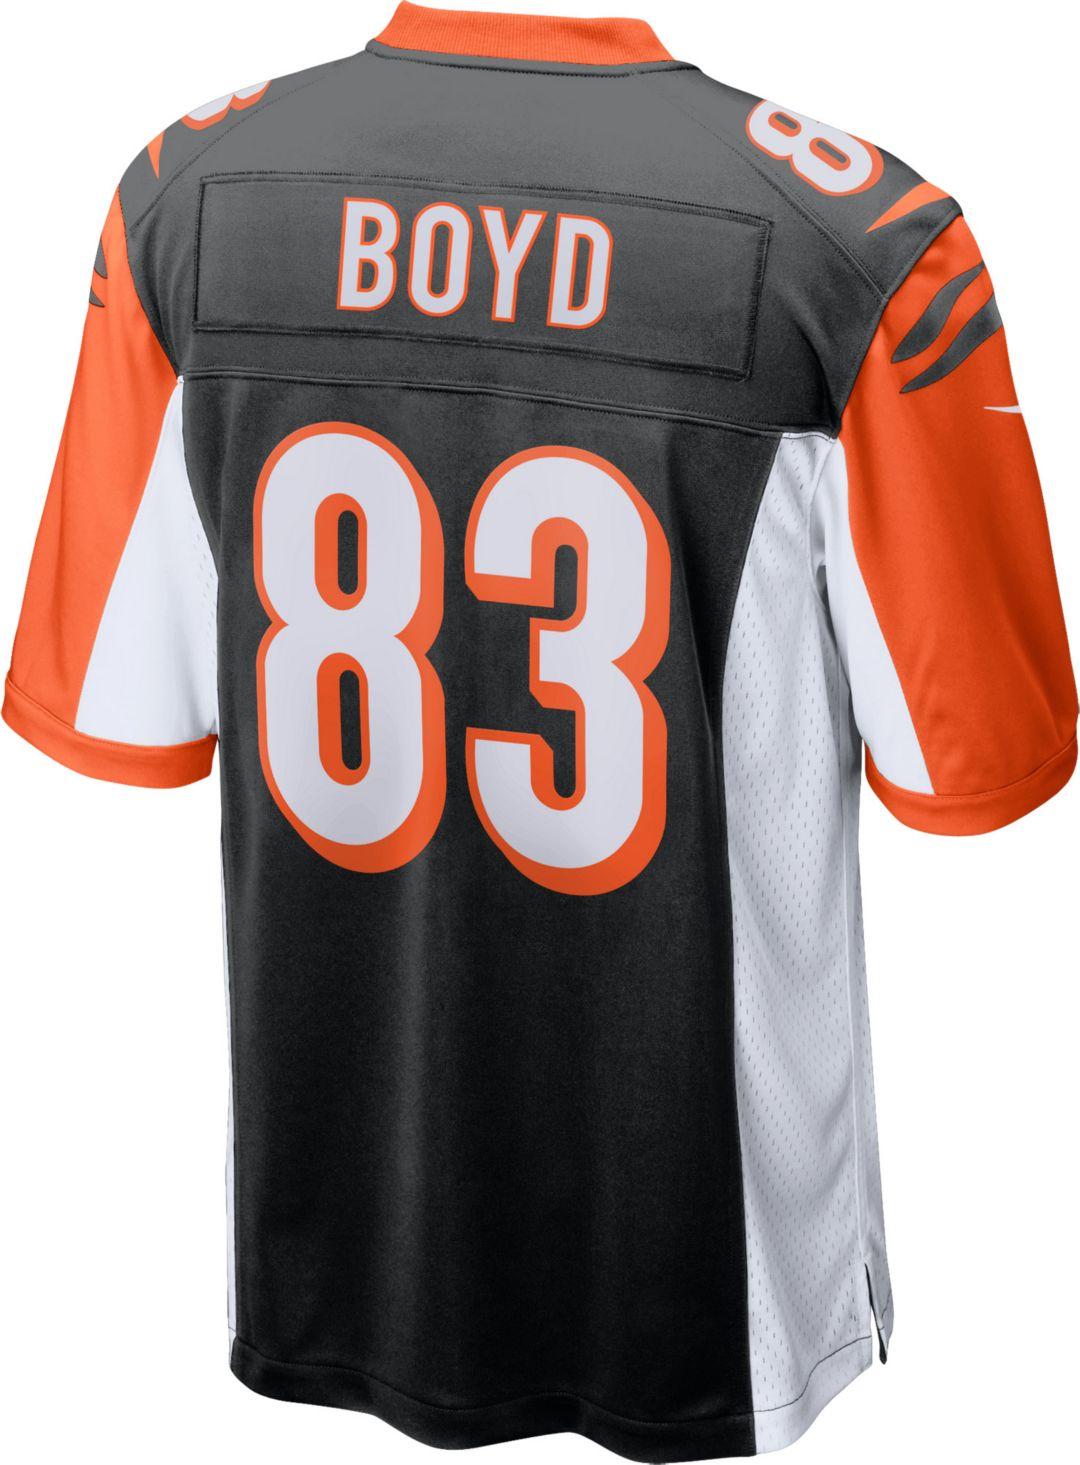 quality design 19efd 8484f Nike Men's Home Game Jersey Cincinnati Bengals Tyler Boyd #83